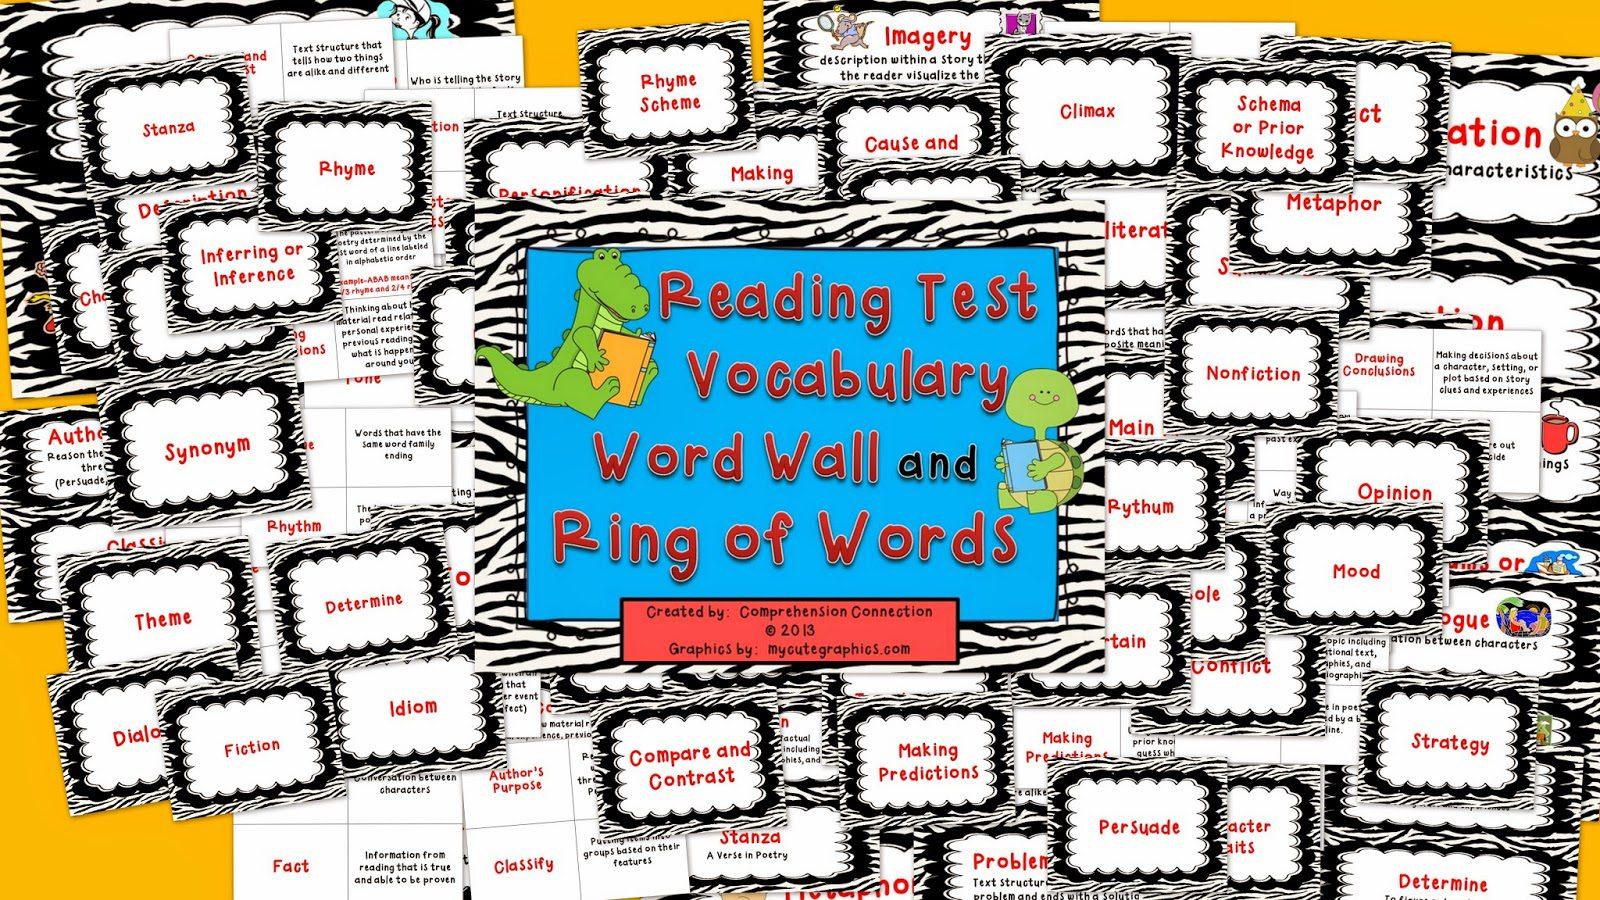 readingvocabularywordwall-8722598